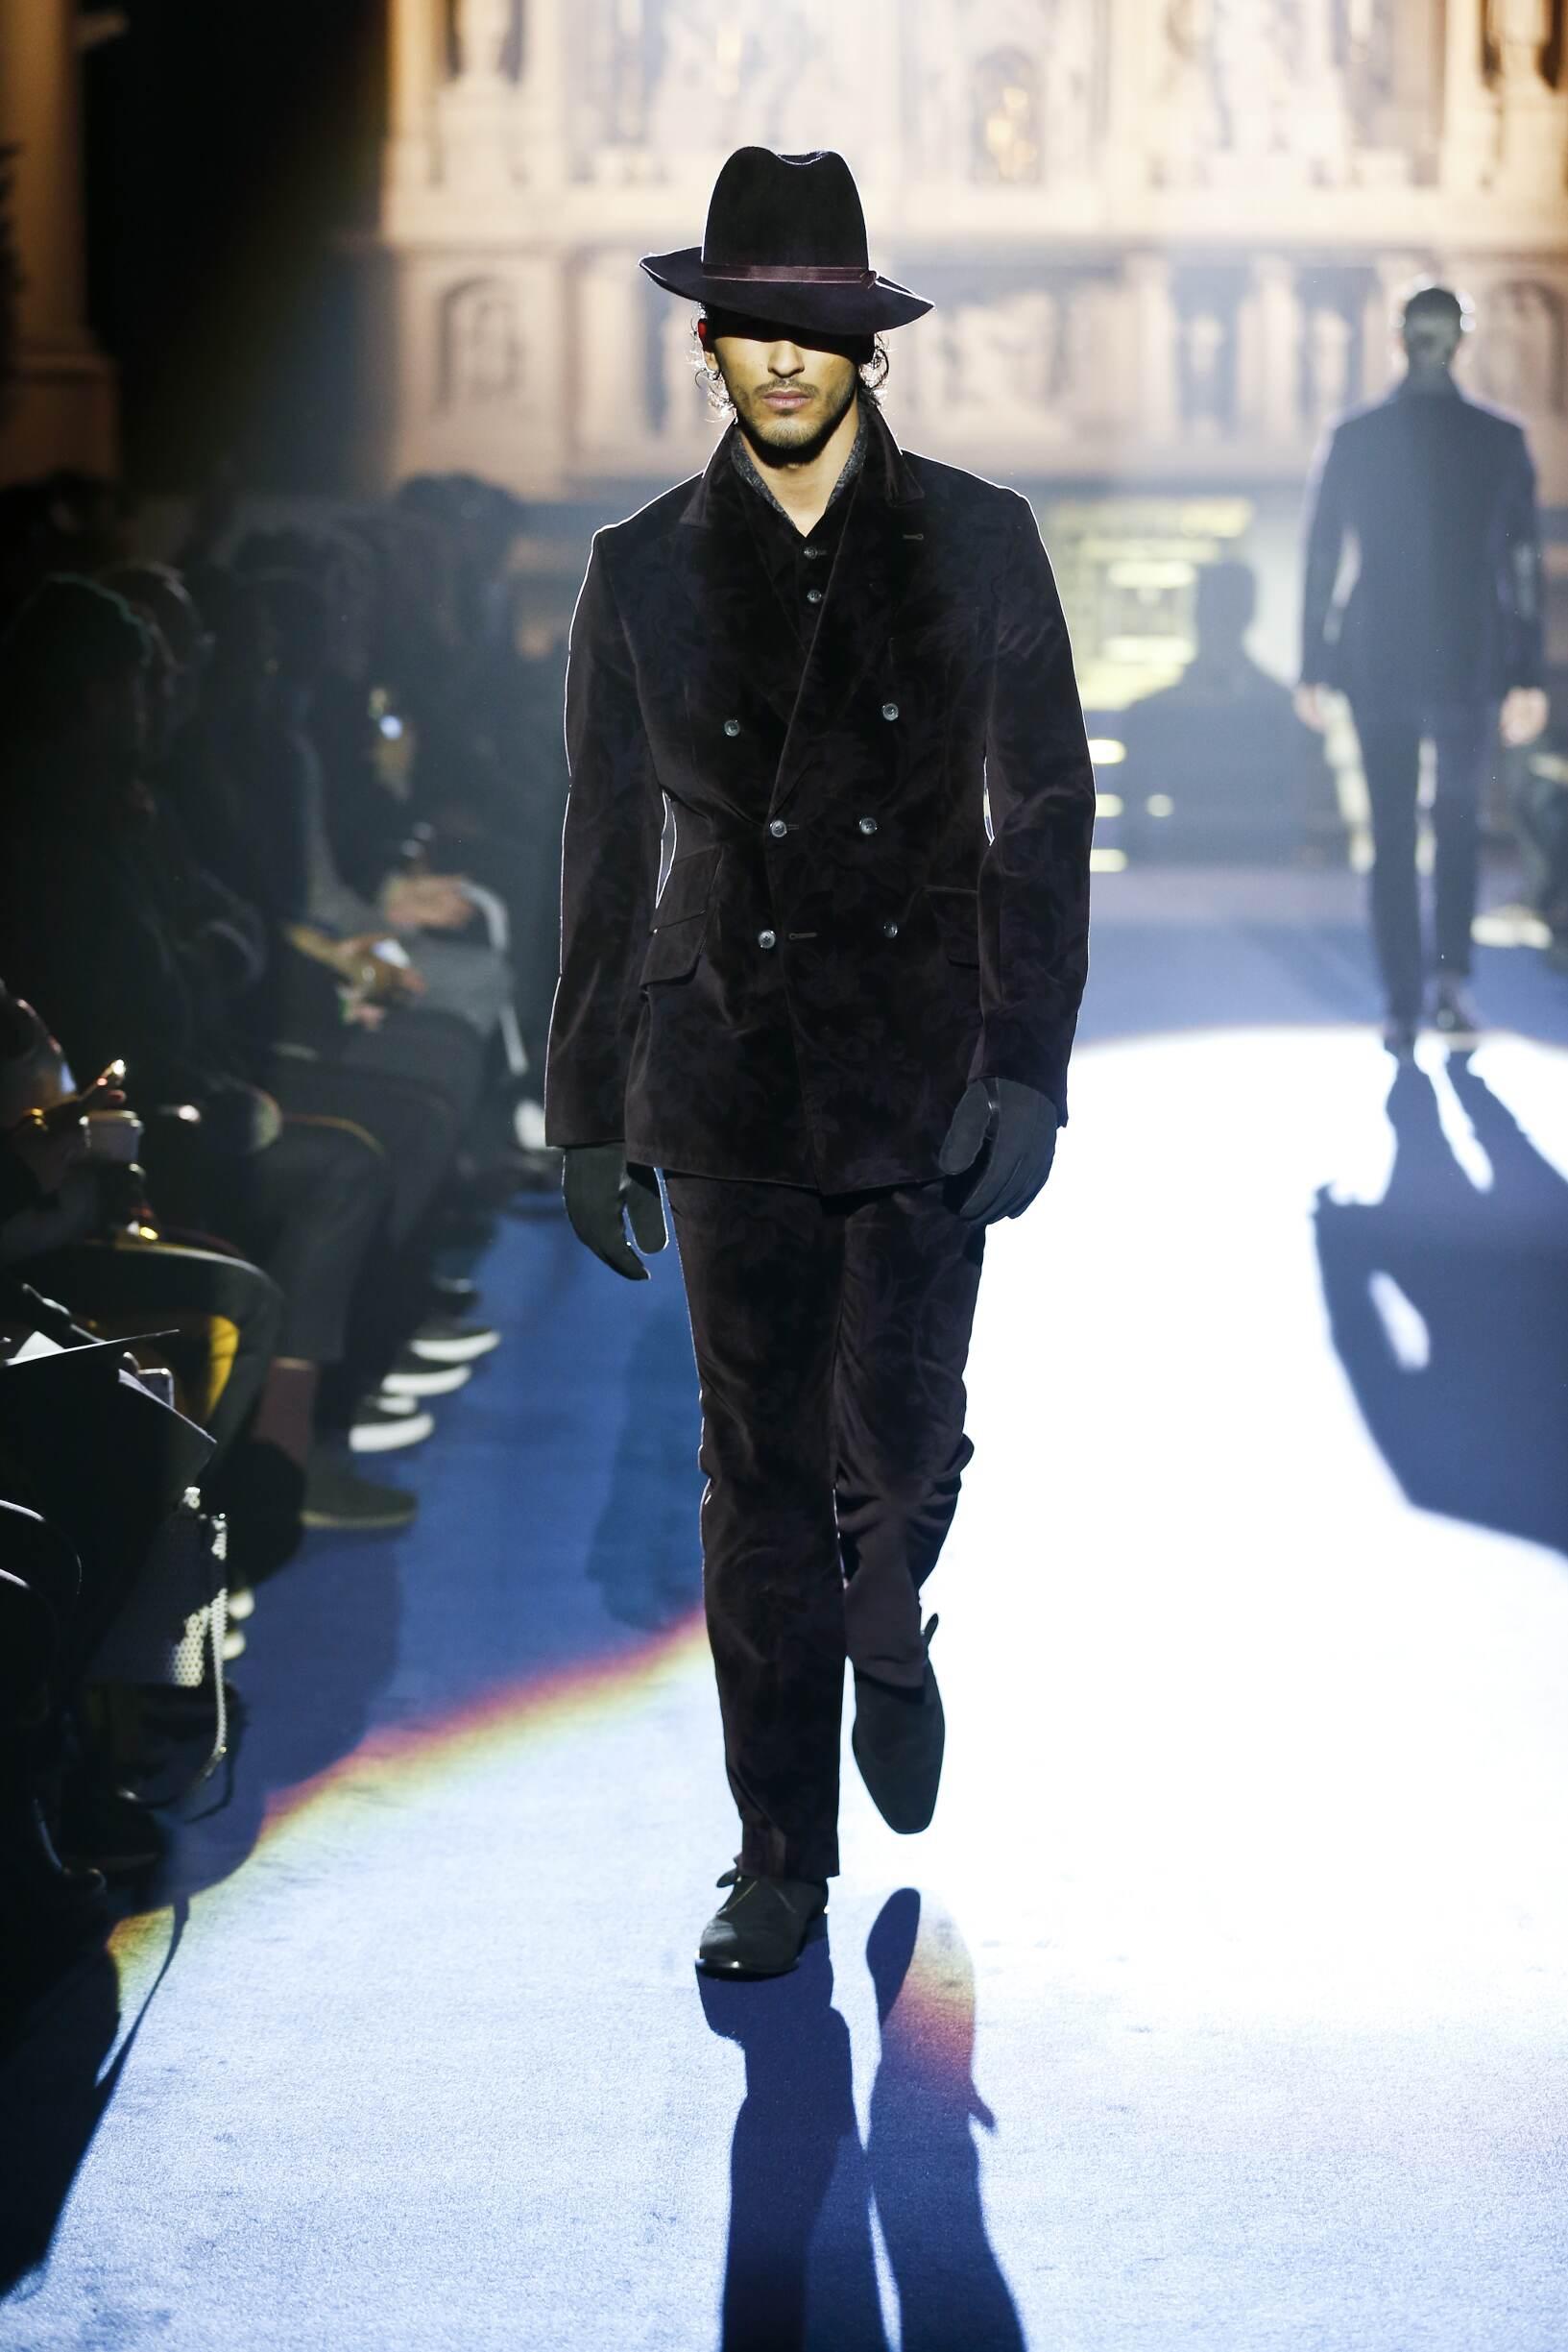 Catwalk Joseph Abboud Man Fashion Show Winter 2017